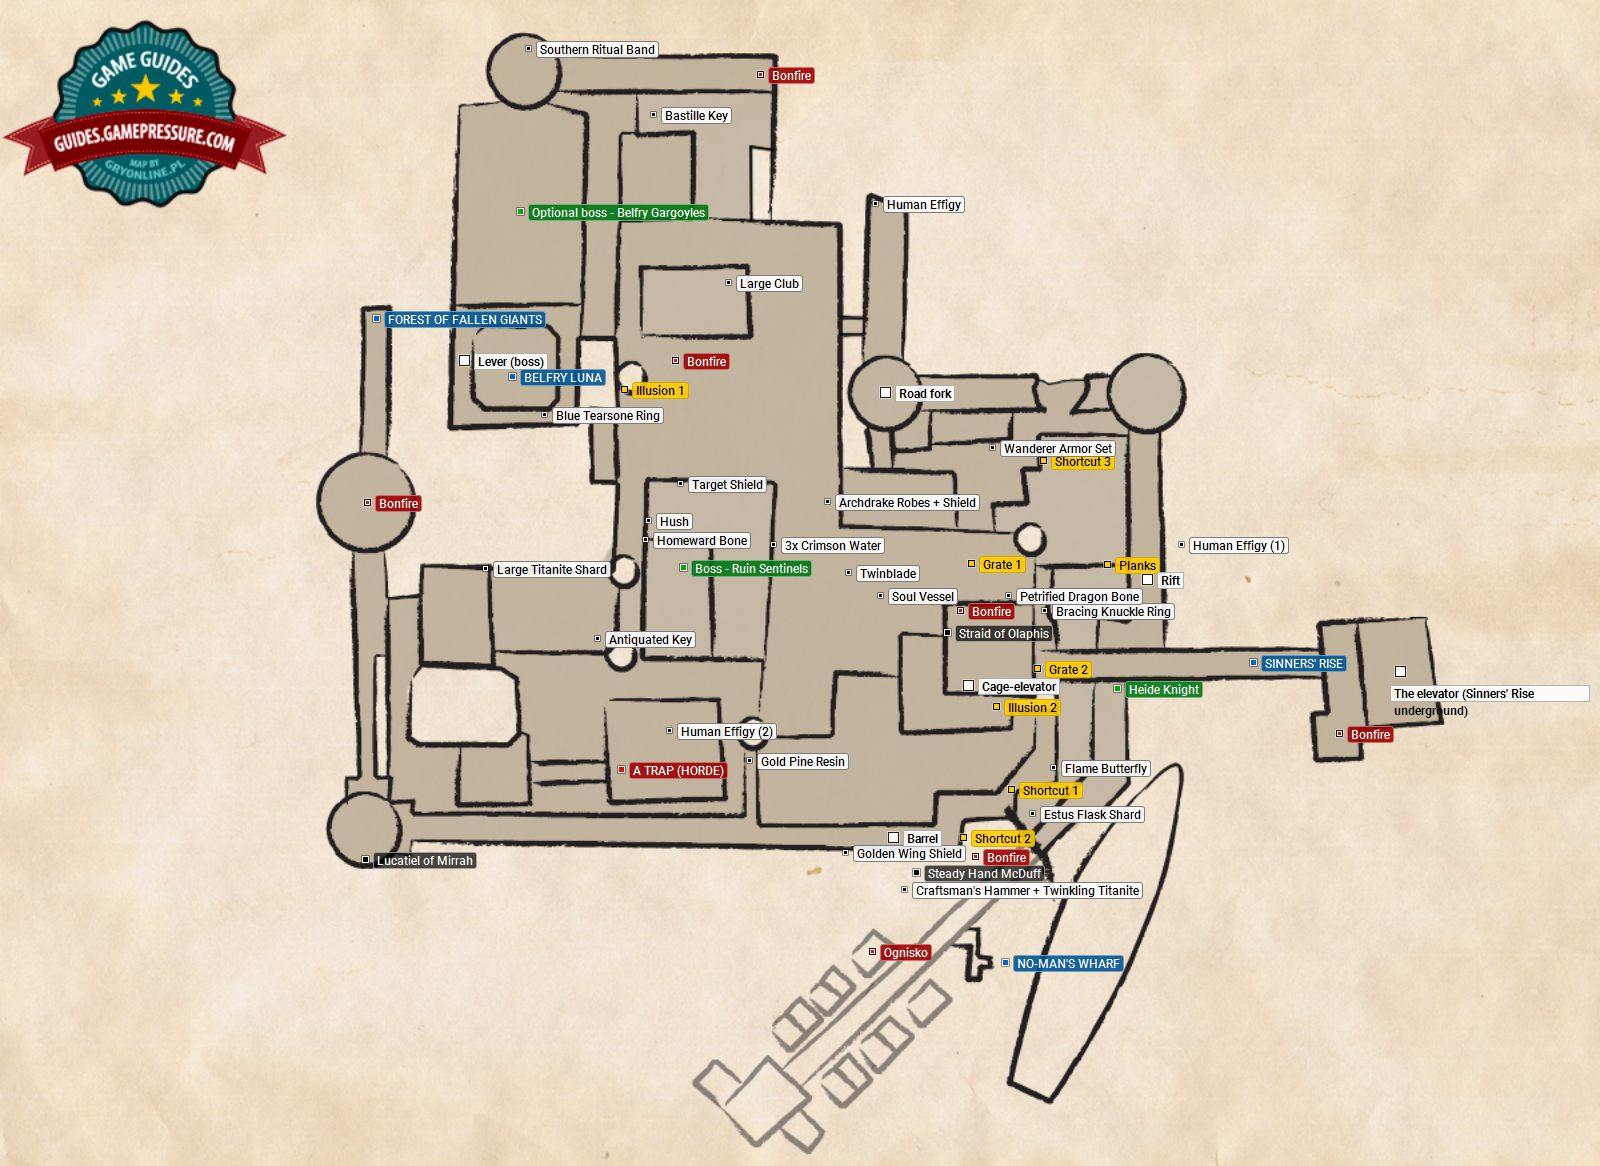 The Lost Bastille | Walkthrough - Dark Souls II Game Guide ... Dark Souls Scholar Of The First Sin Map on dark souls 2 xbox one, dark souls 2 giant sword, dark souls 2 pursuer, dark souls 2 knight,